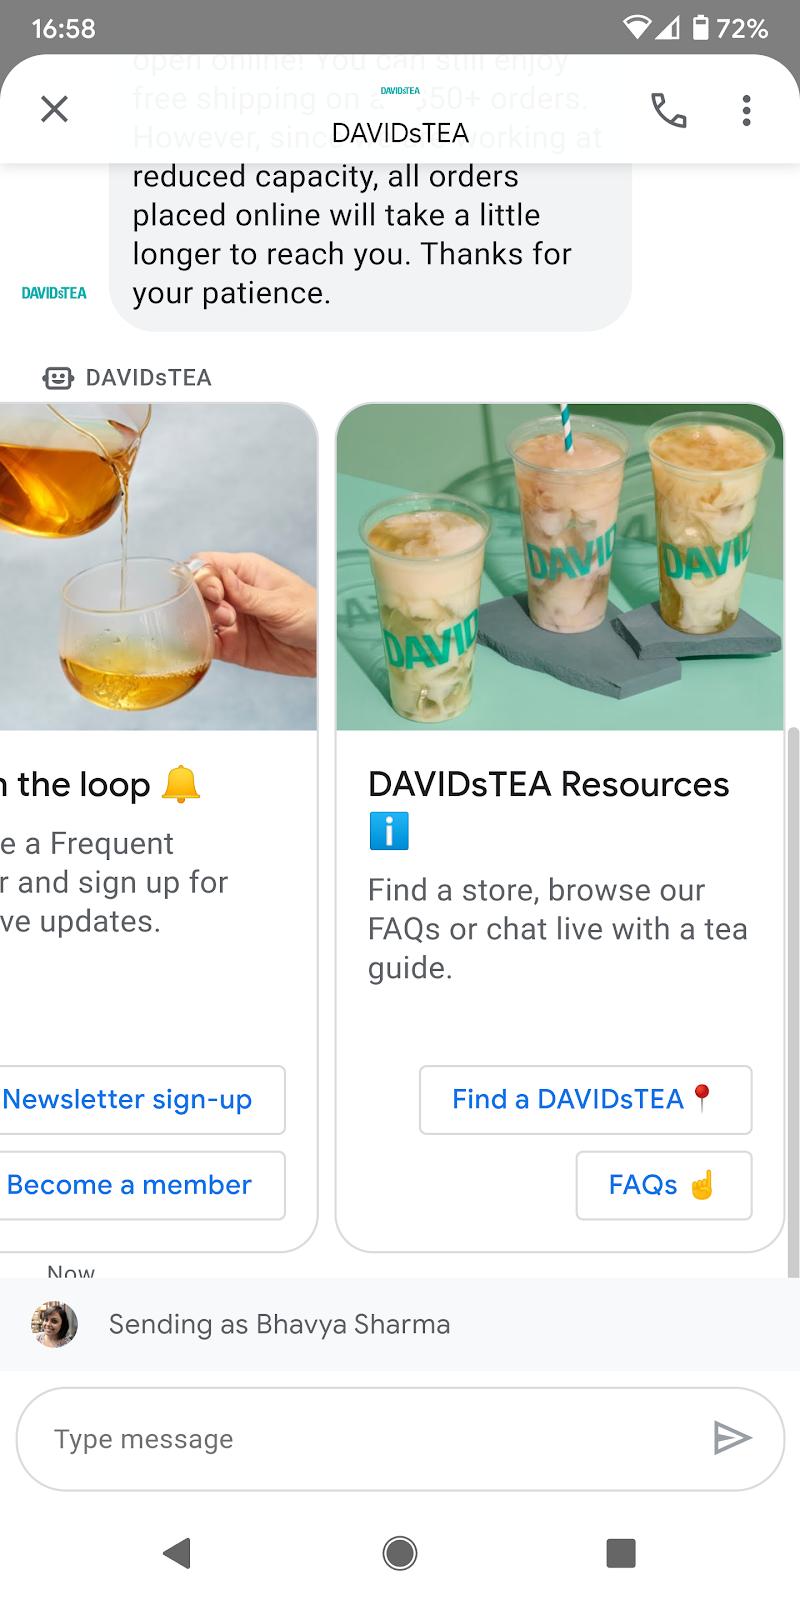 DAVIDsTEA Chatbot_Google Business Messages_Heyday